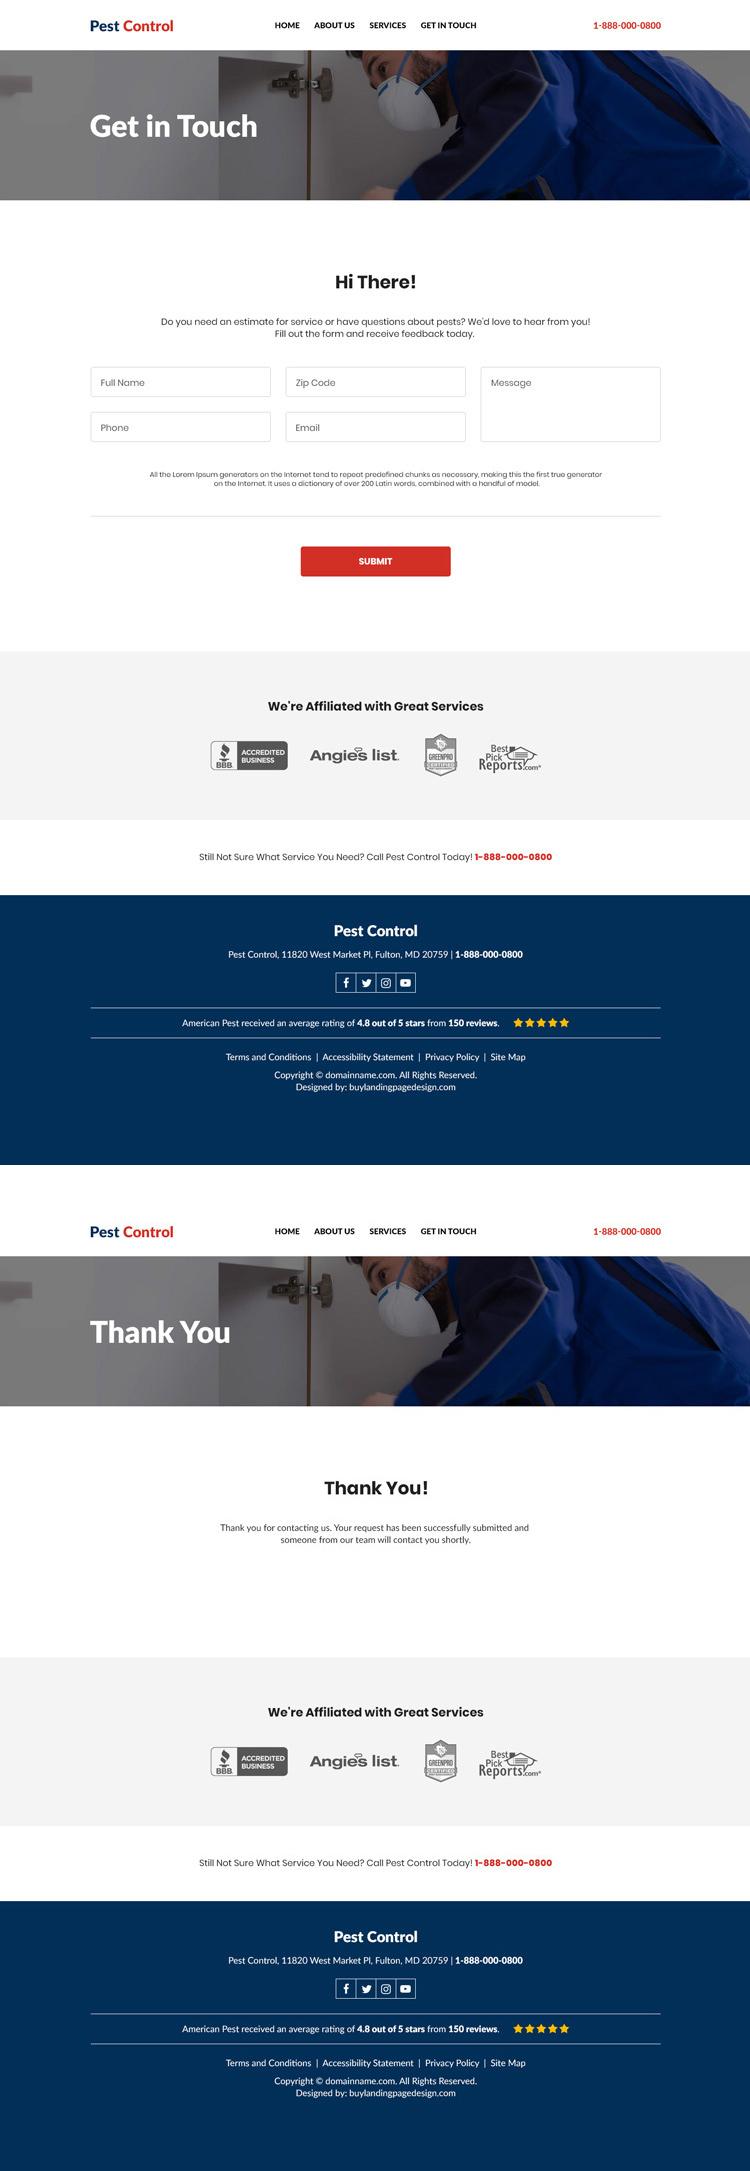 reliable pest control service responsive website design